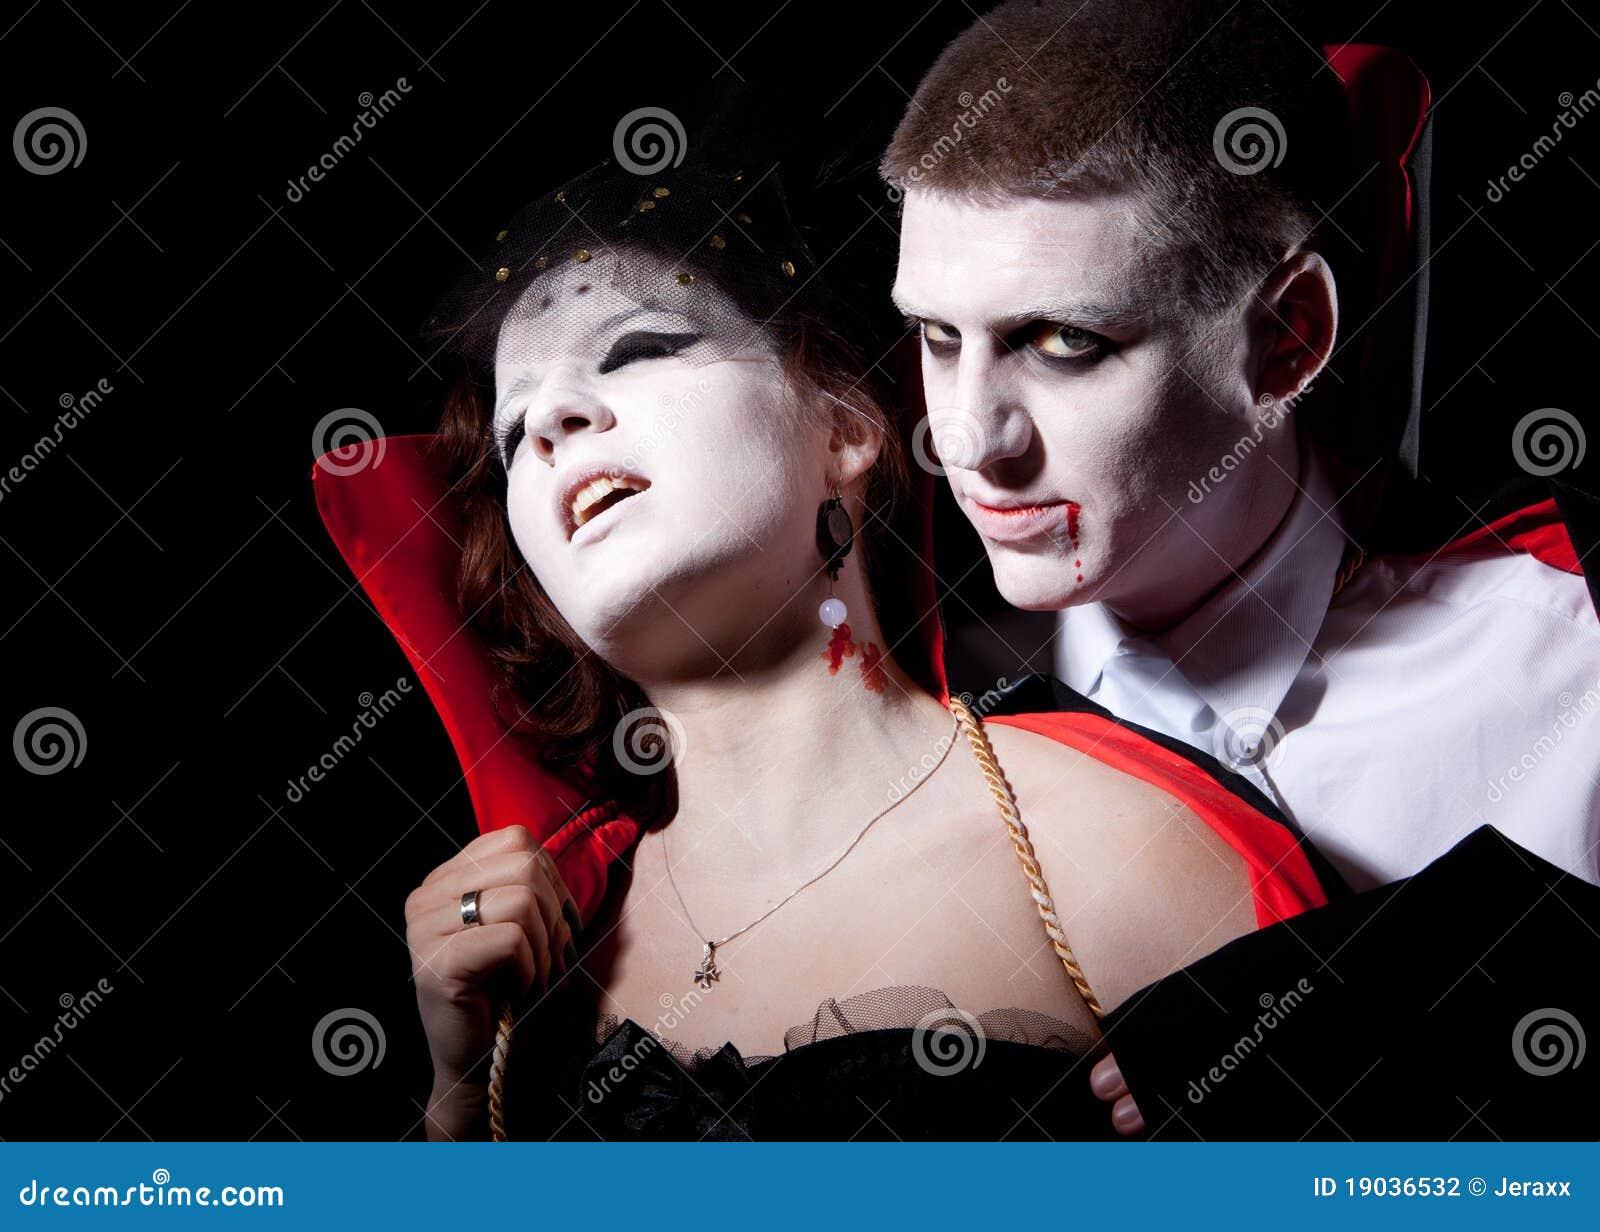 vampires biting people - photo #6